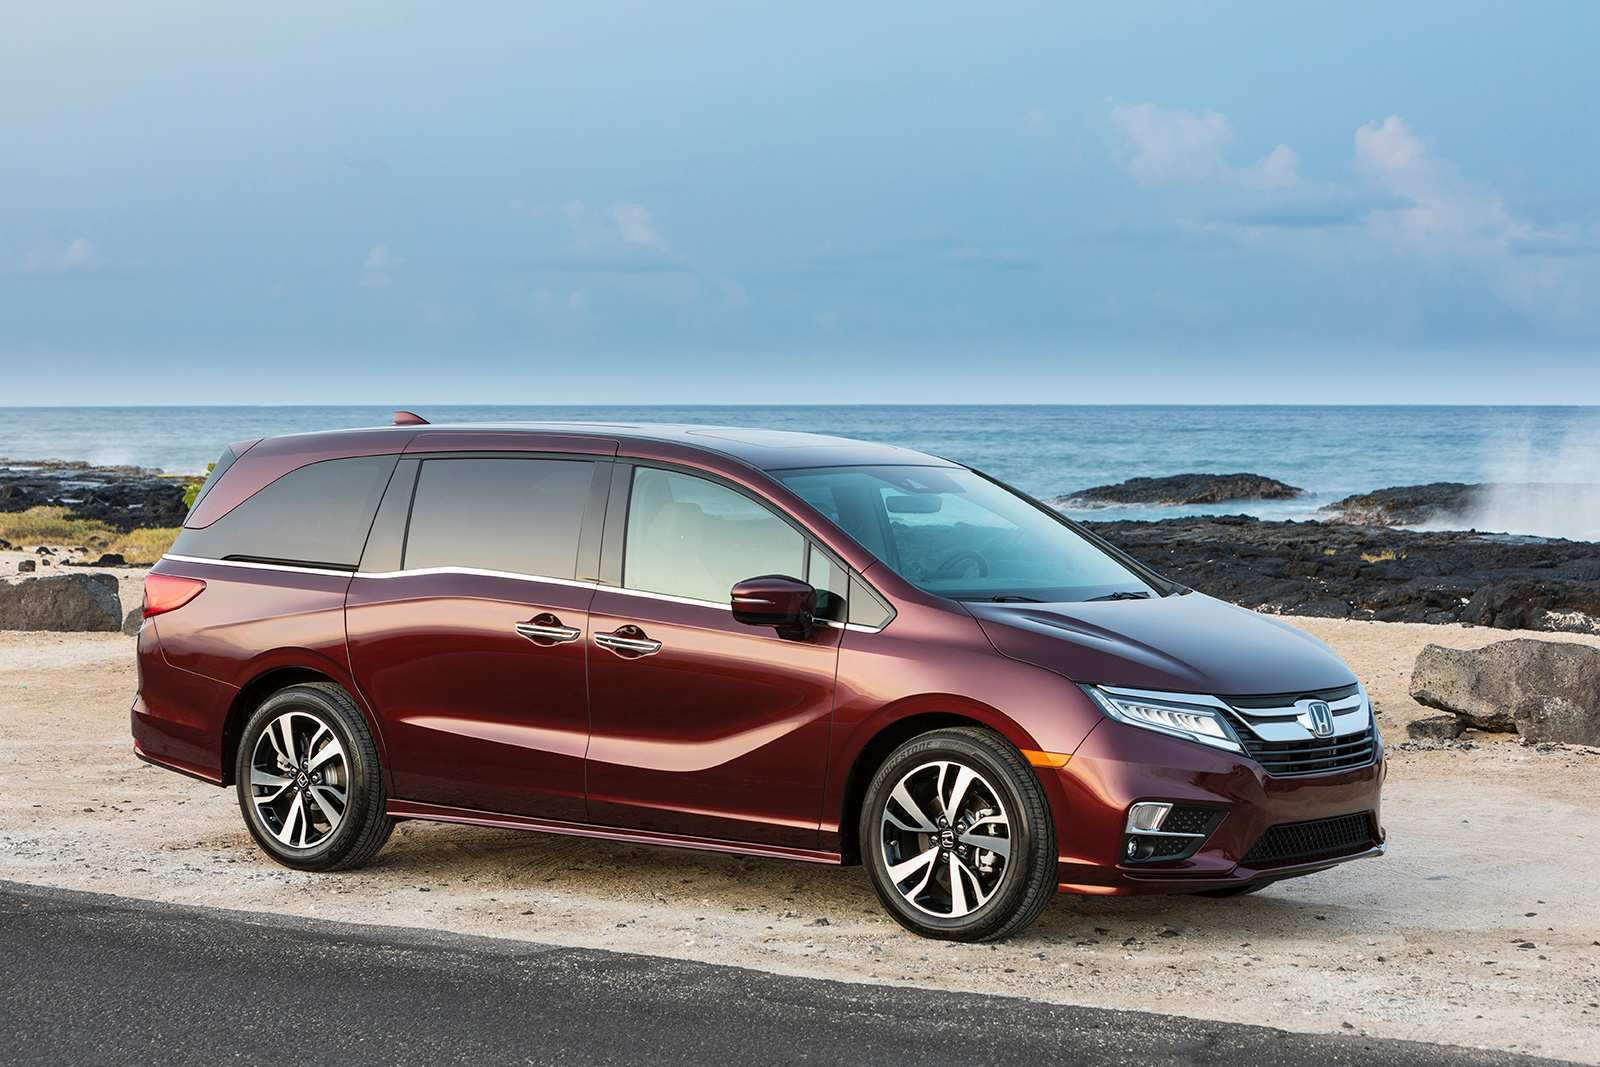 72 New 2019 Honda Odyssey Release Spy Shoot with 2019 Honda Odyssey Release